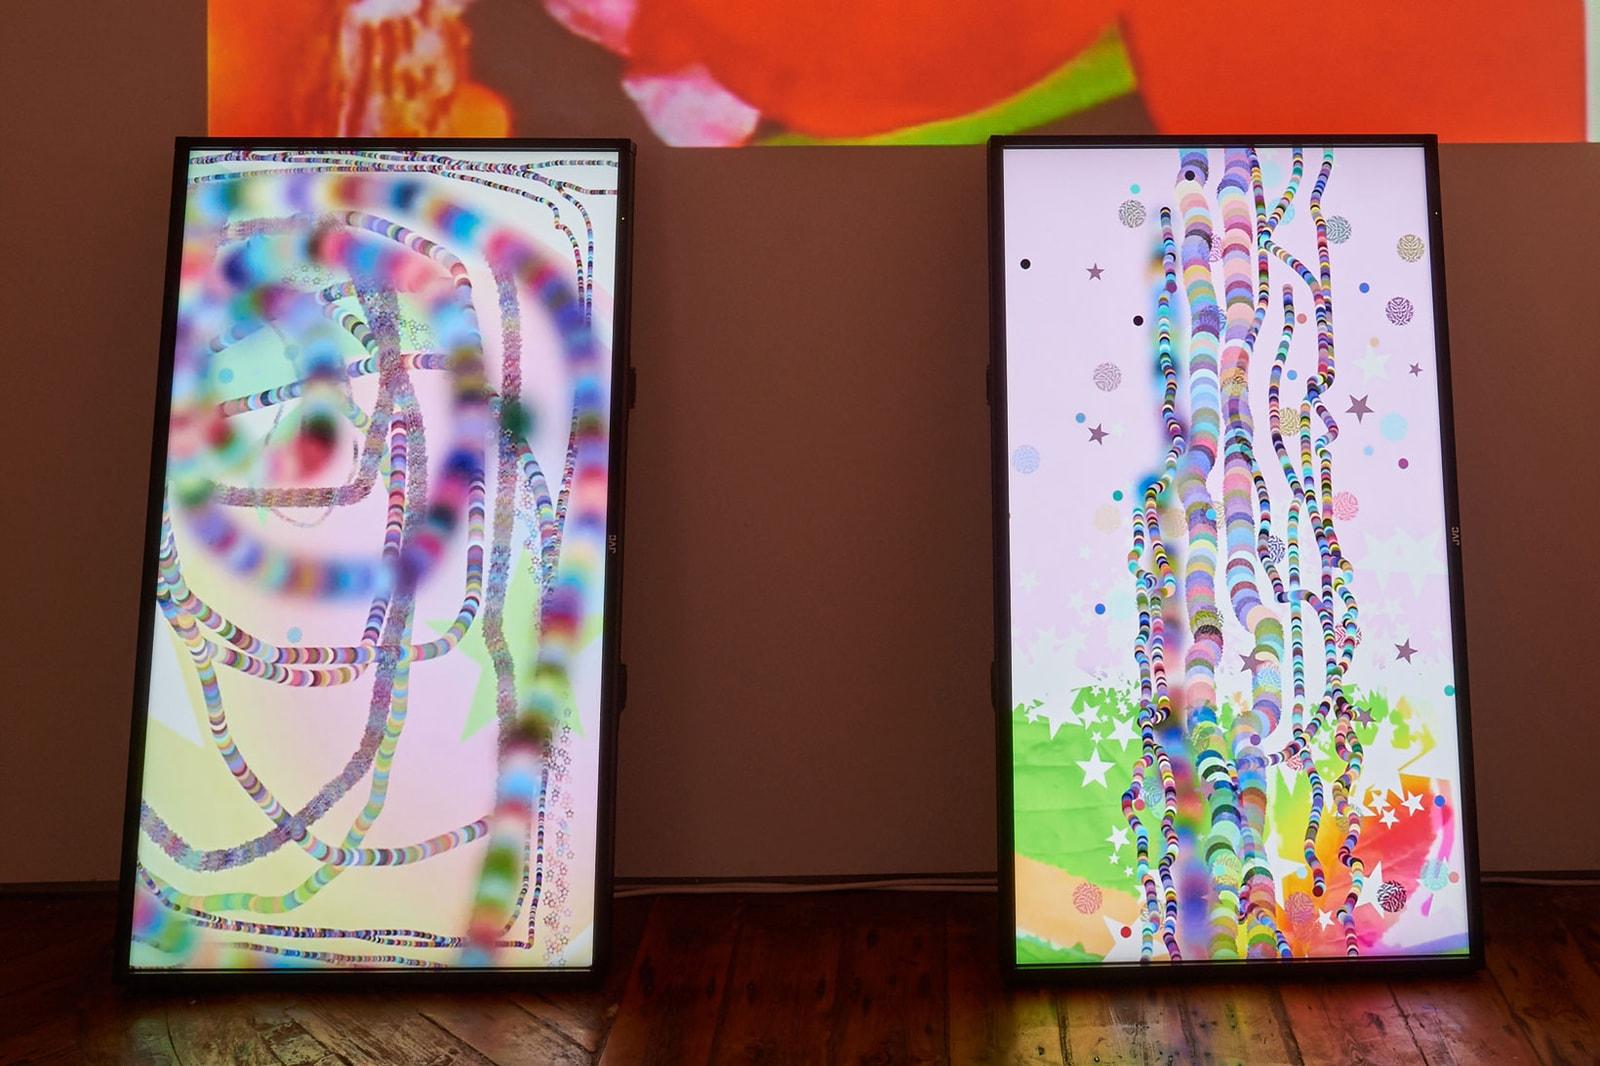 Virgil Abloh Dollar a Gallon III Art Basel 2019 Paseo Ponti